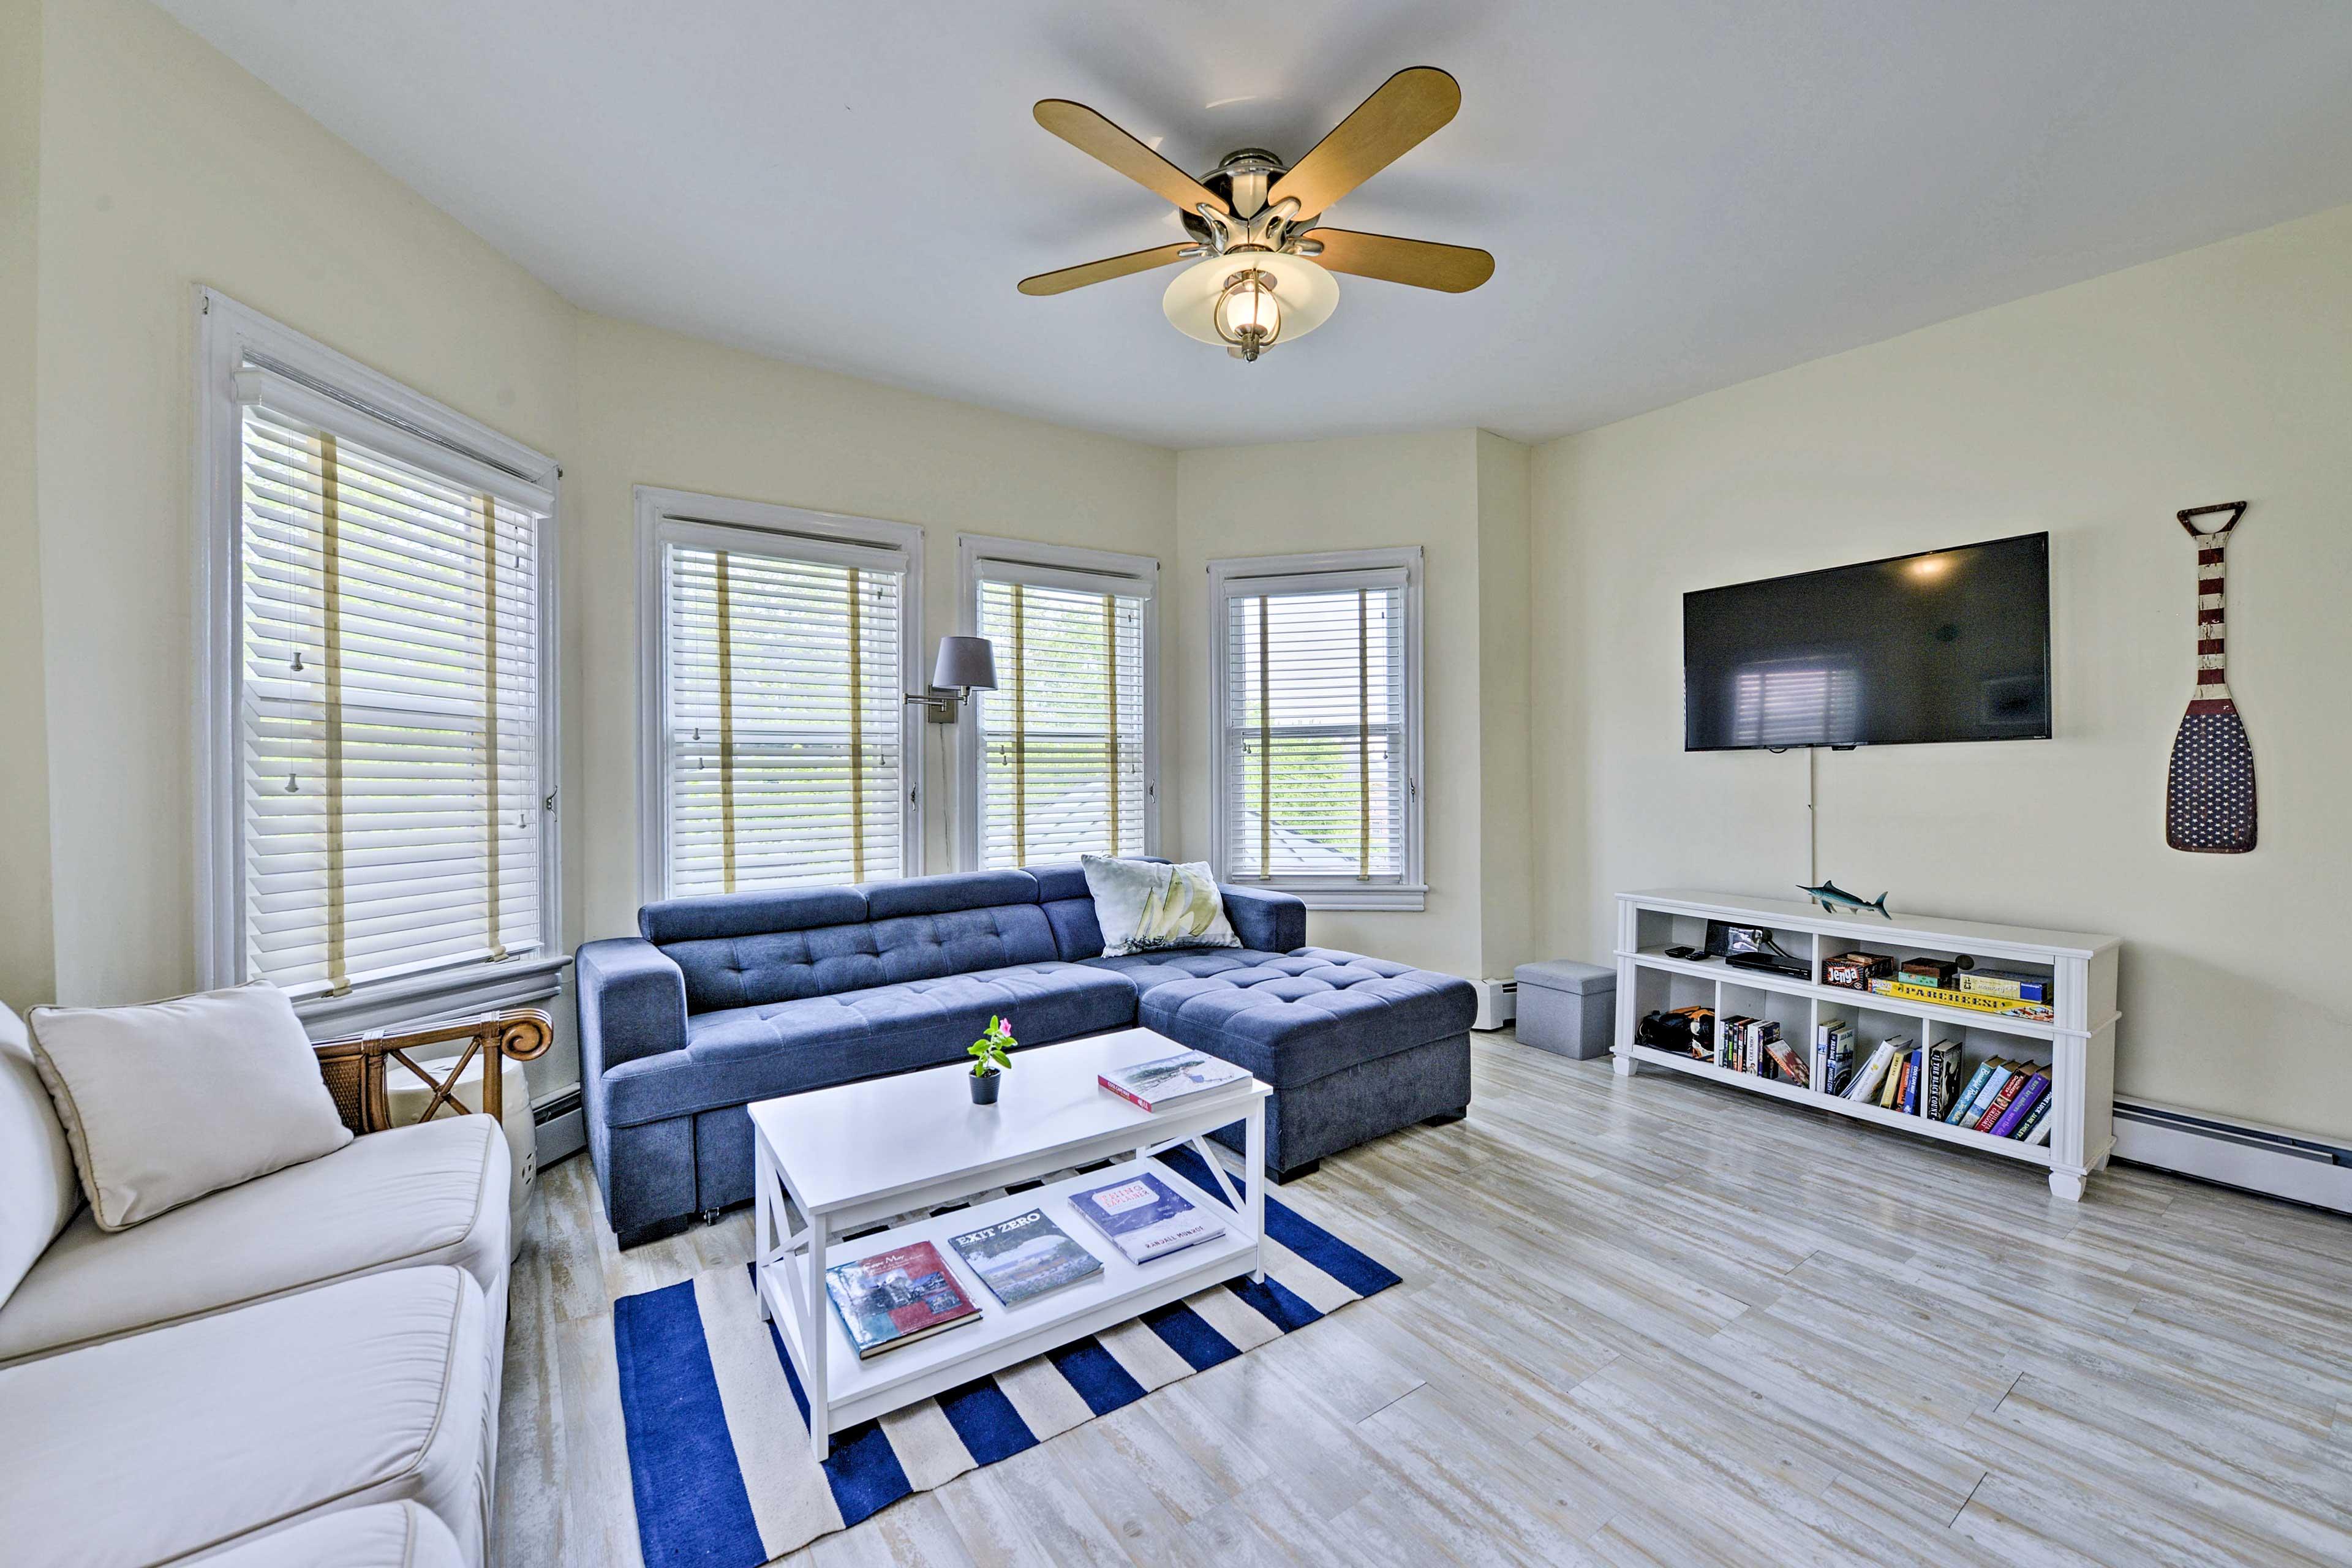 This 1-bedroom, 1-bath vacation rental condo offers a beautiful beachy interior.